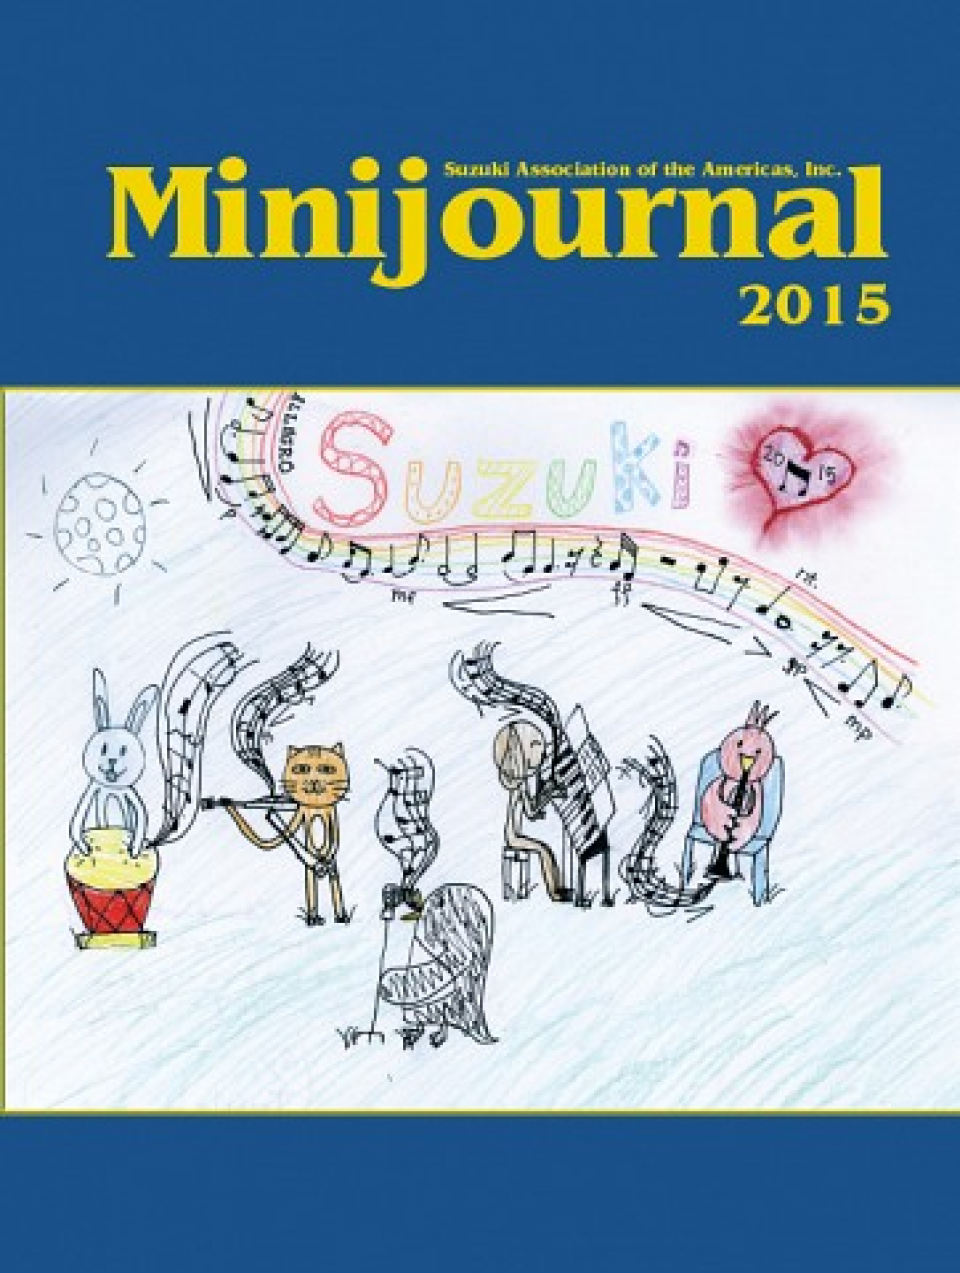 Minijournal 2015